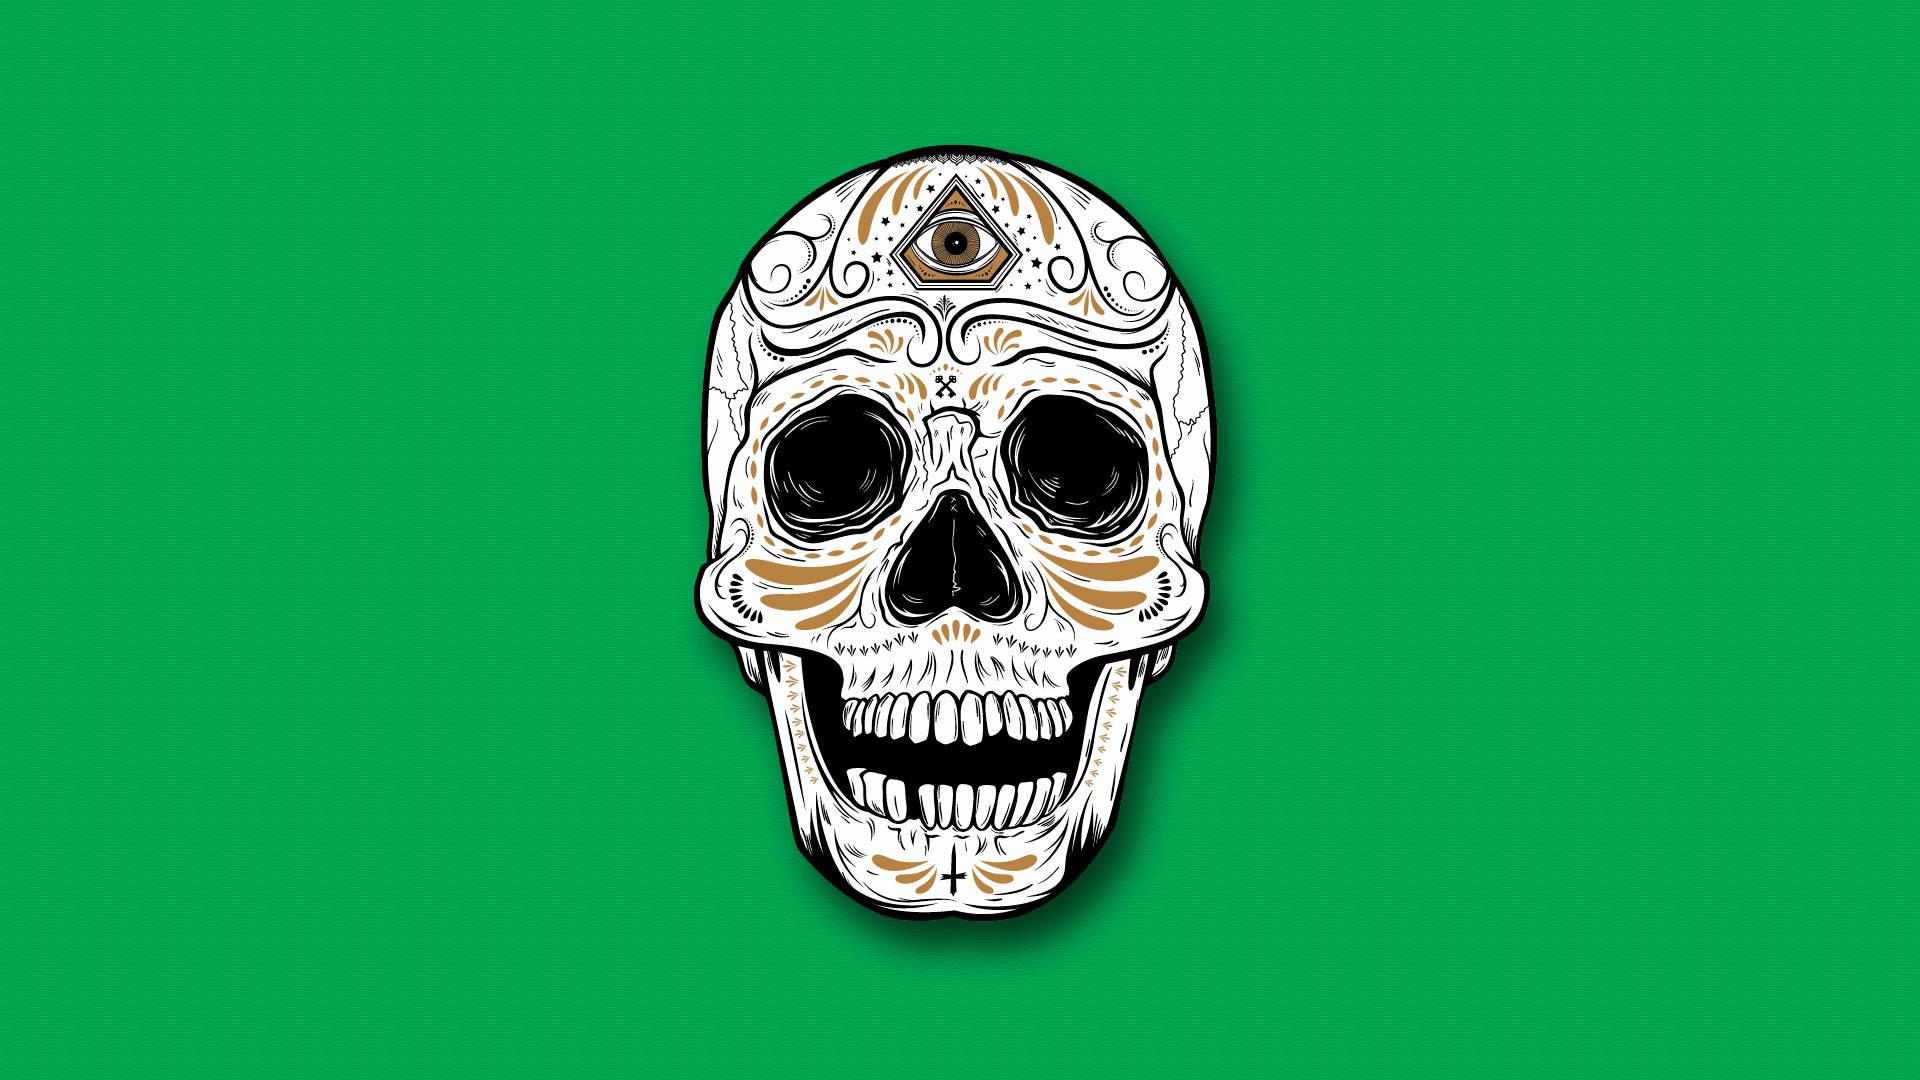 Colorful Skull Iphone Wallpaper Sugar Skull Wallpaper For Iphone 62 Images